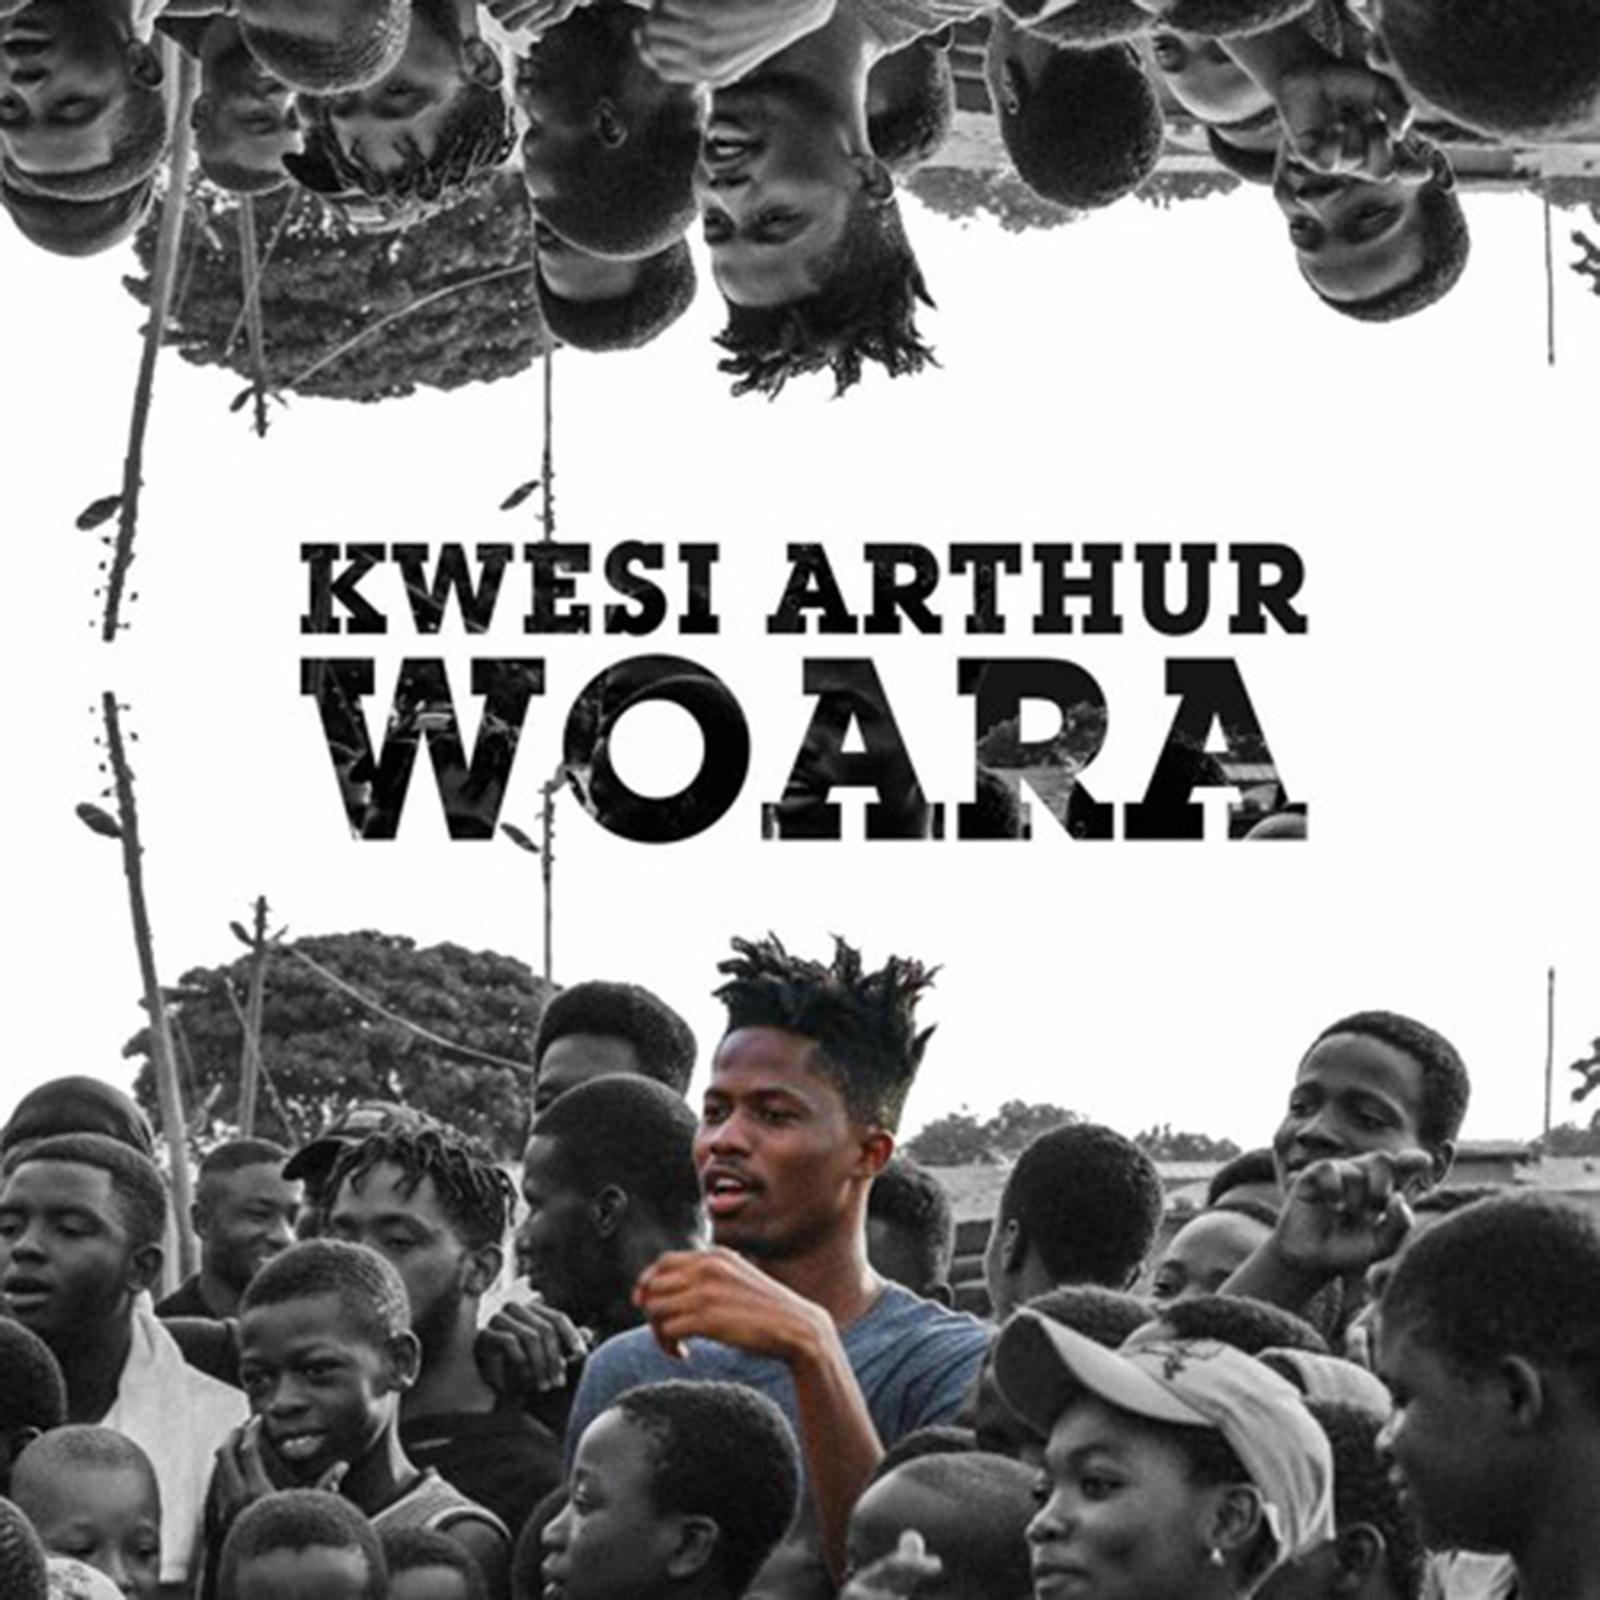 Woara by Kwesi Arthur